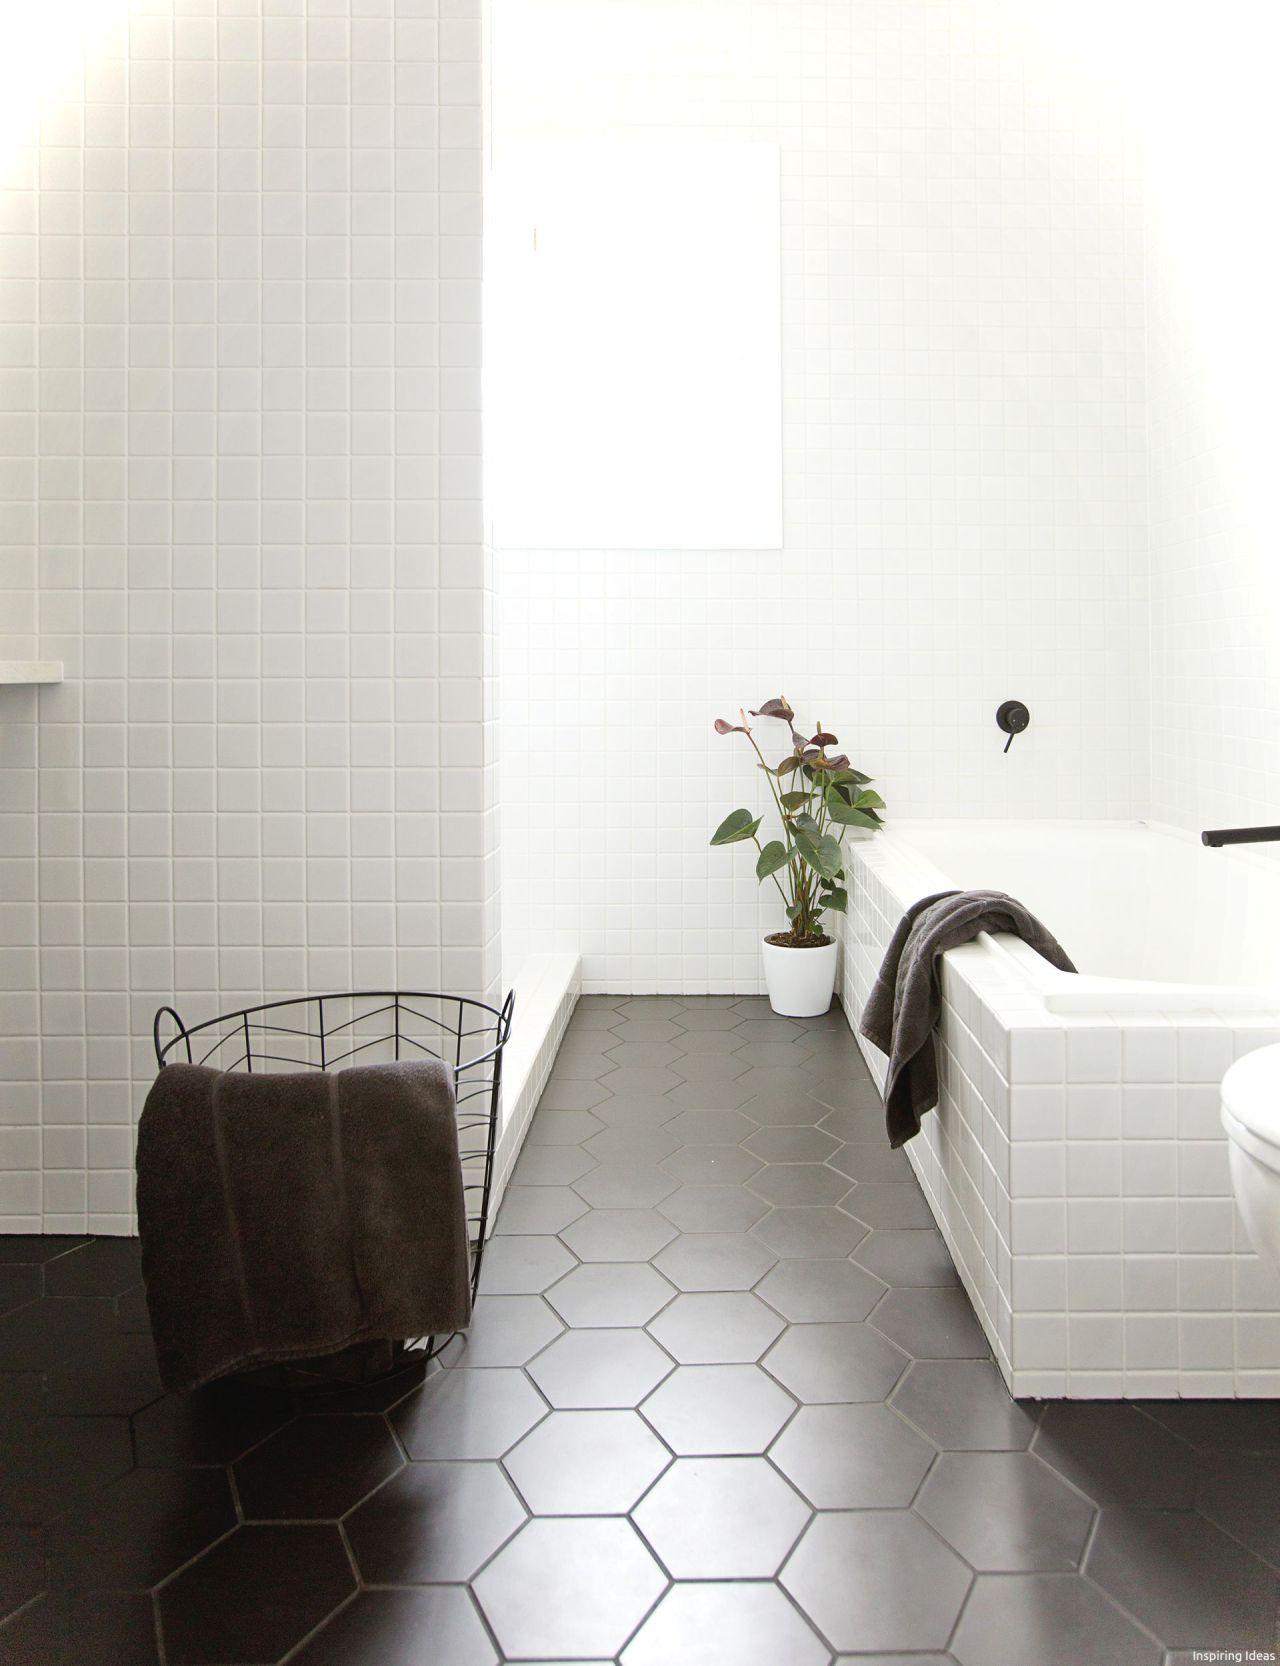 Black & White Bathroom With Black Tiles And White Tub